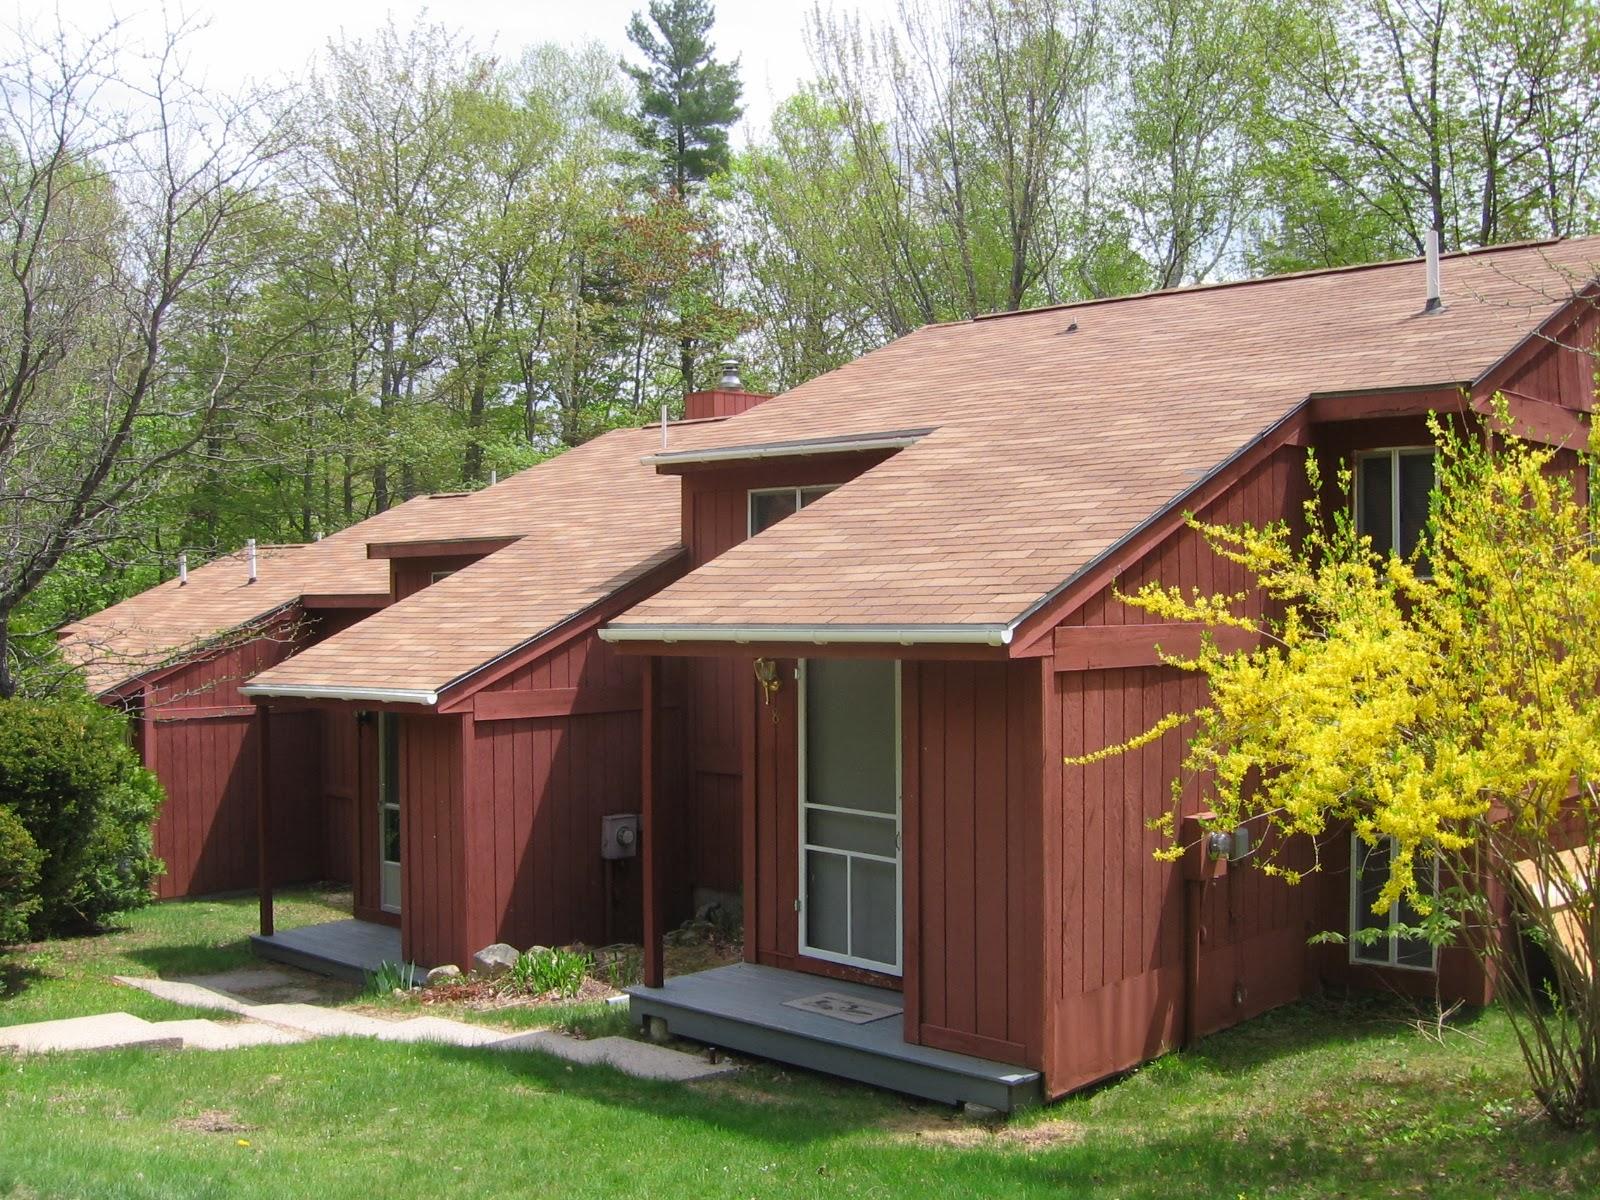 Evergreen Valley Vacation Rental